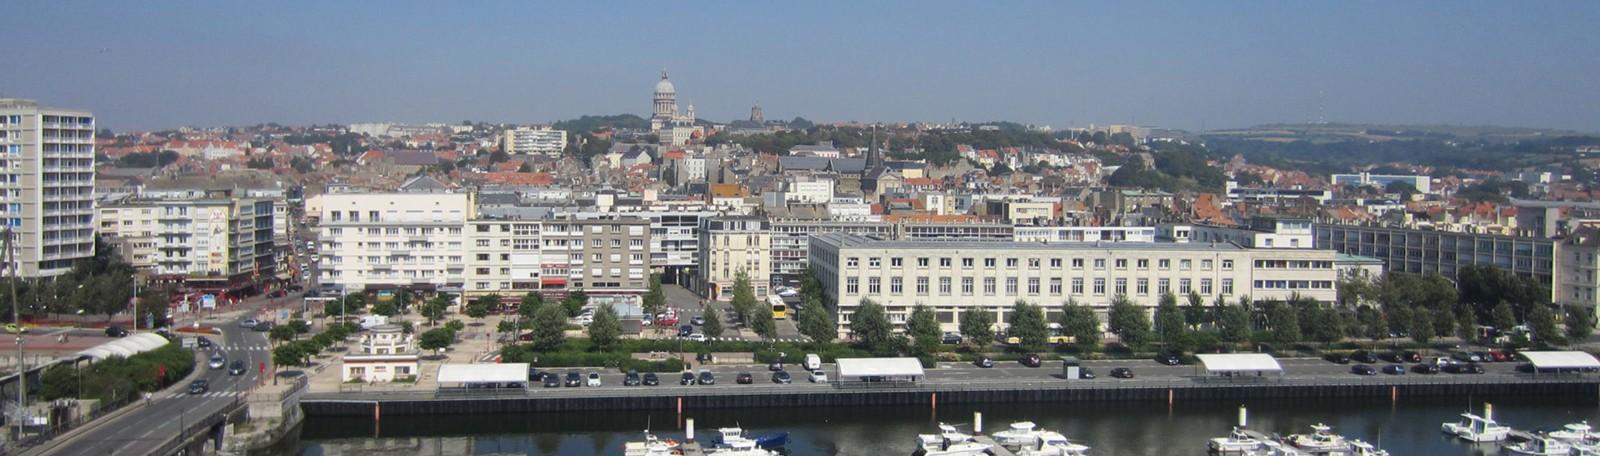 Parking Adolphe Herry - Parkeren in Boulogne sur Mer | Q-Park